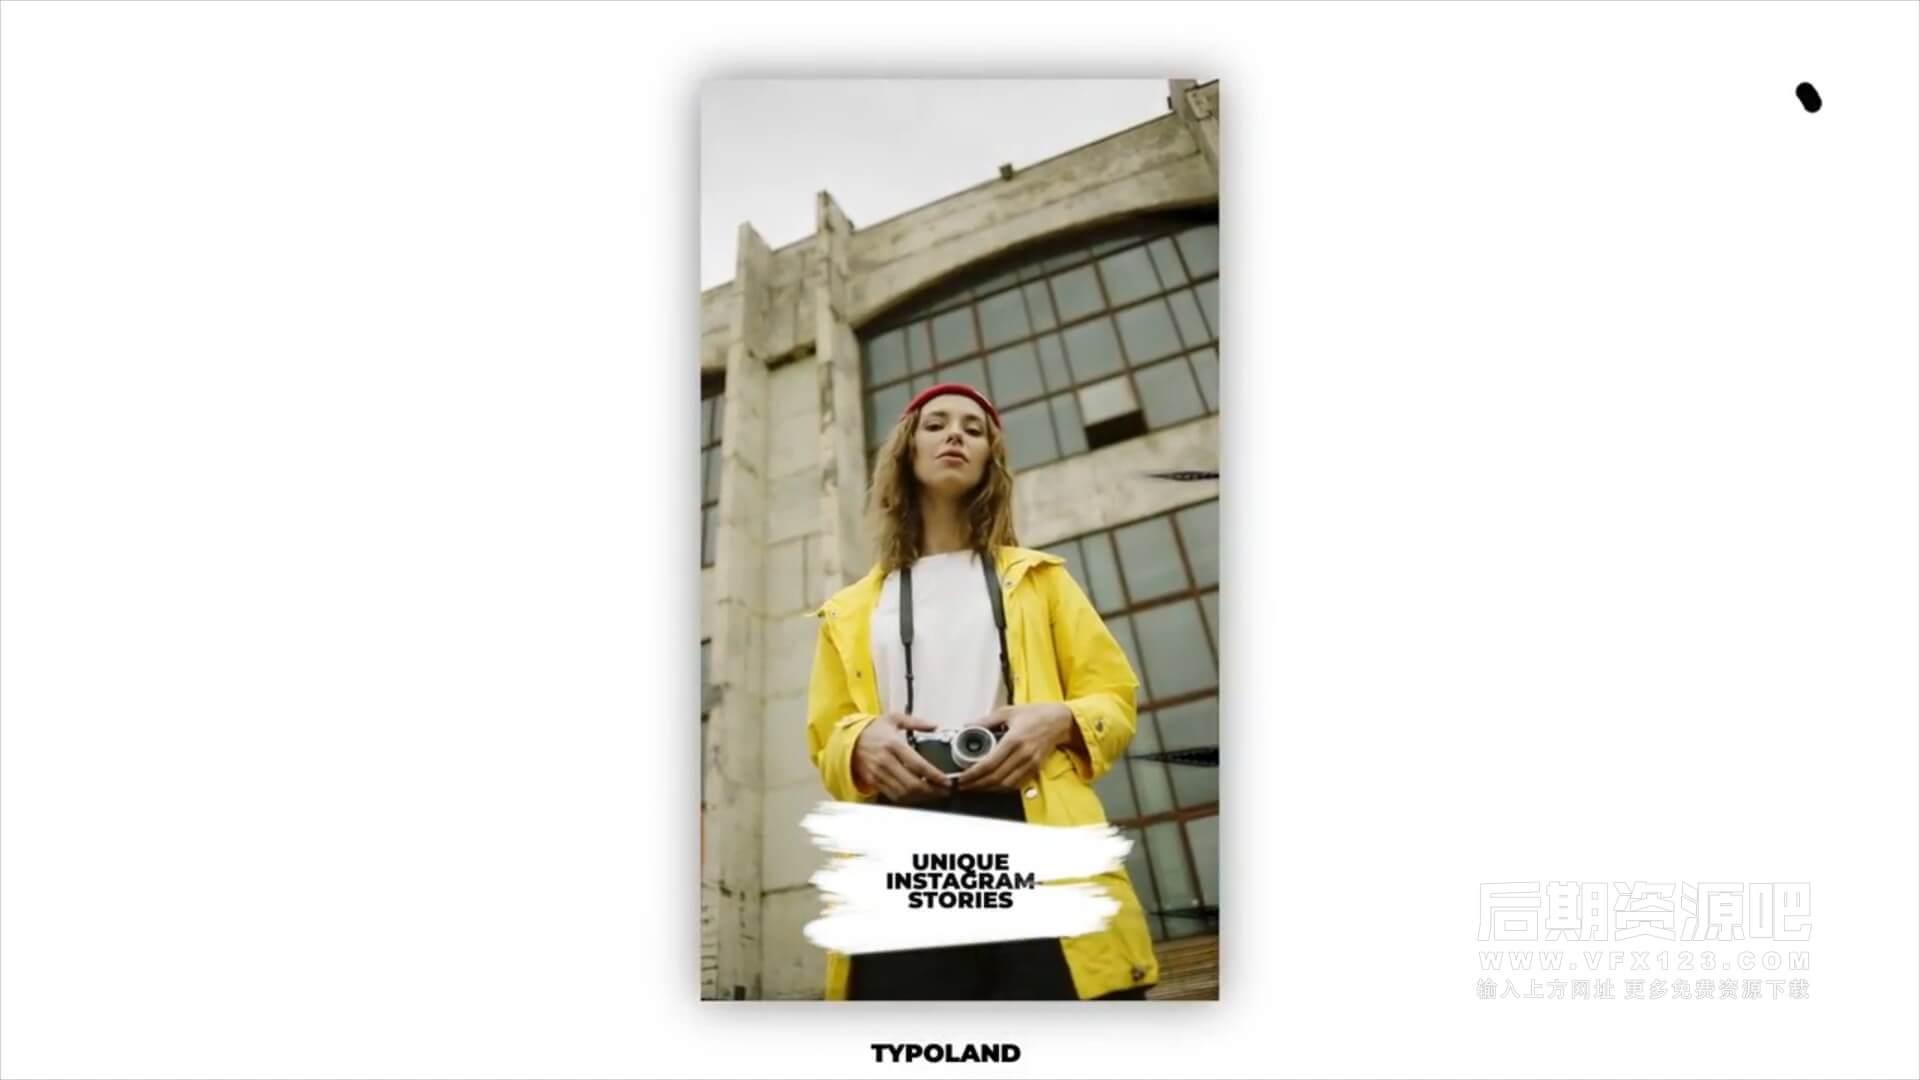 fcpx竖屏模板 6组时尚现代手机短视频片头模板 Instagram Stories